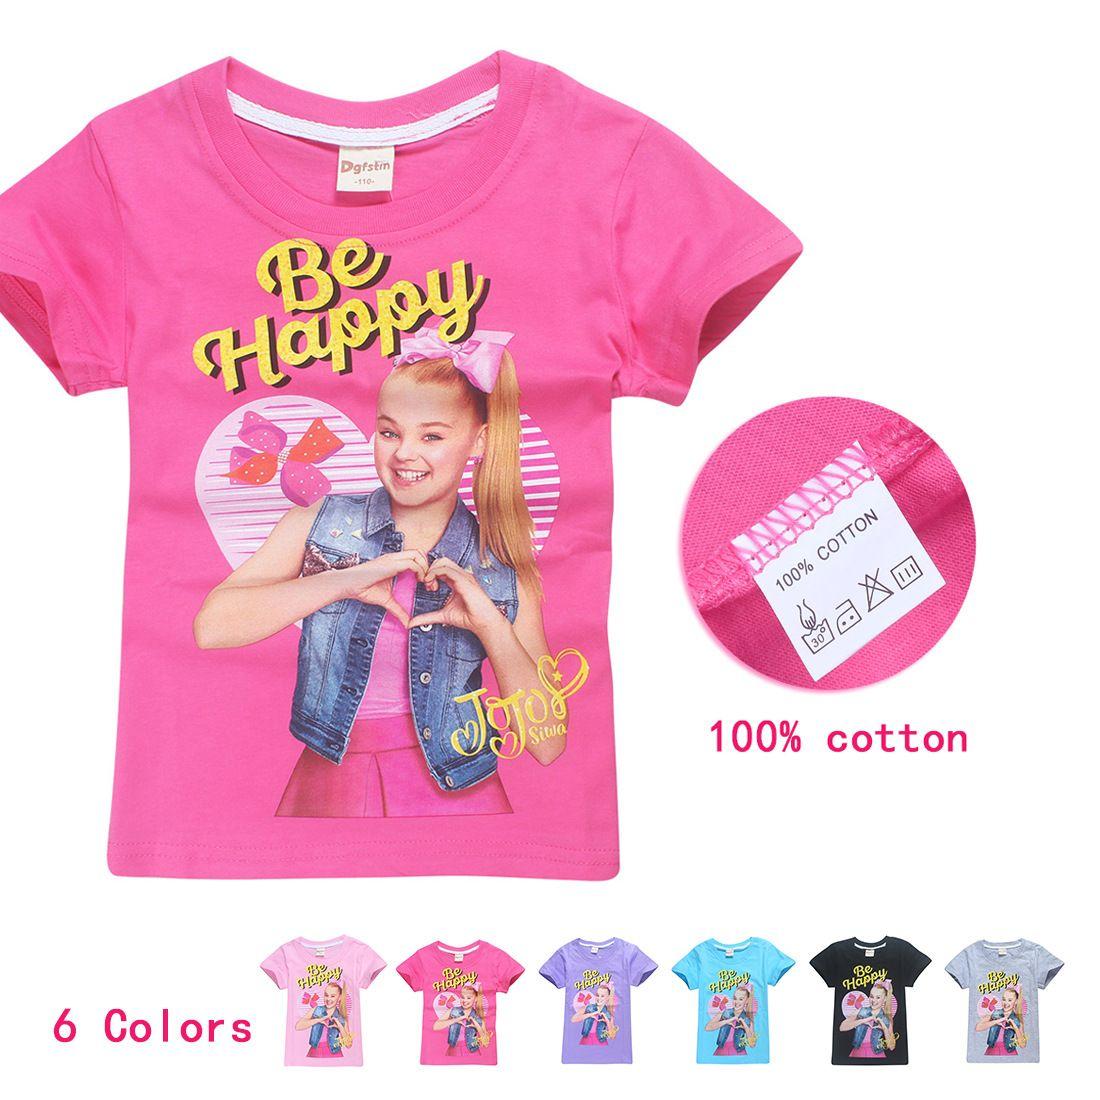 2018 Hot Sale Children s Fashion Teens T Shirt Girls Jojo Siwa Clothing  Casual Sunmmer Short Sleeves Tops Cartoon Baby Clothes Baby Girl Summer  Clothing . 836e5049a114